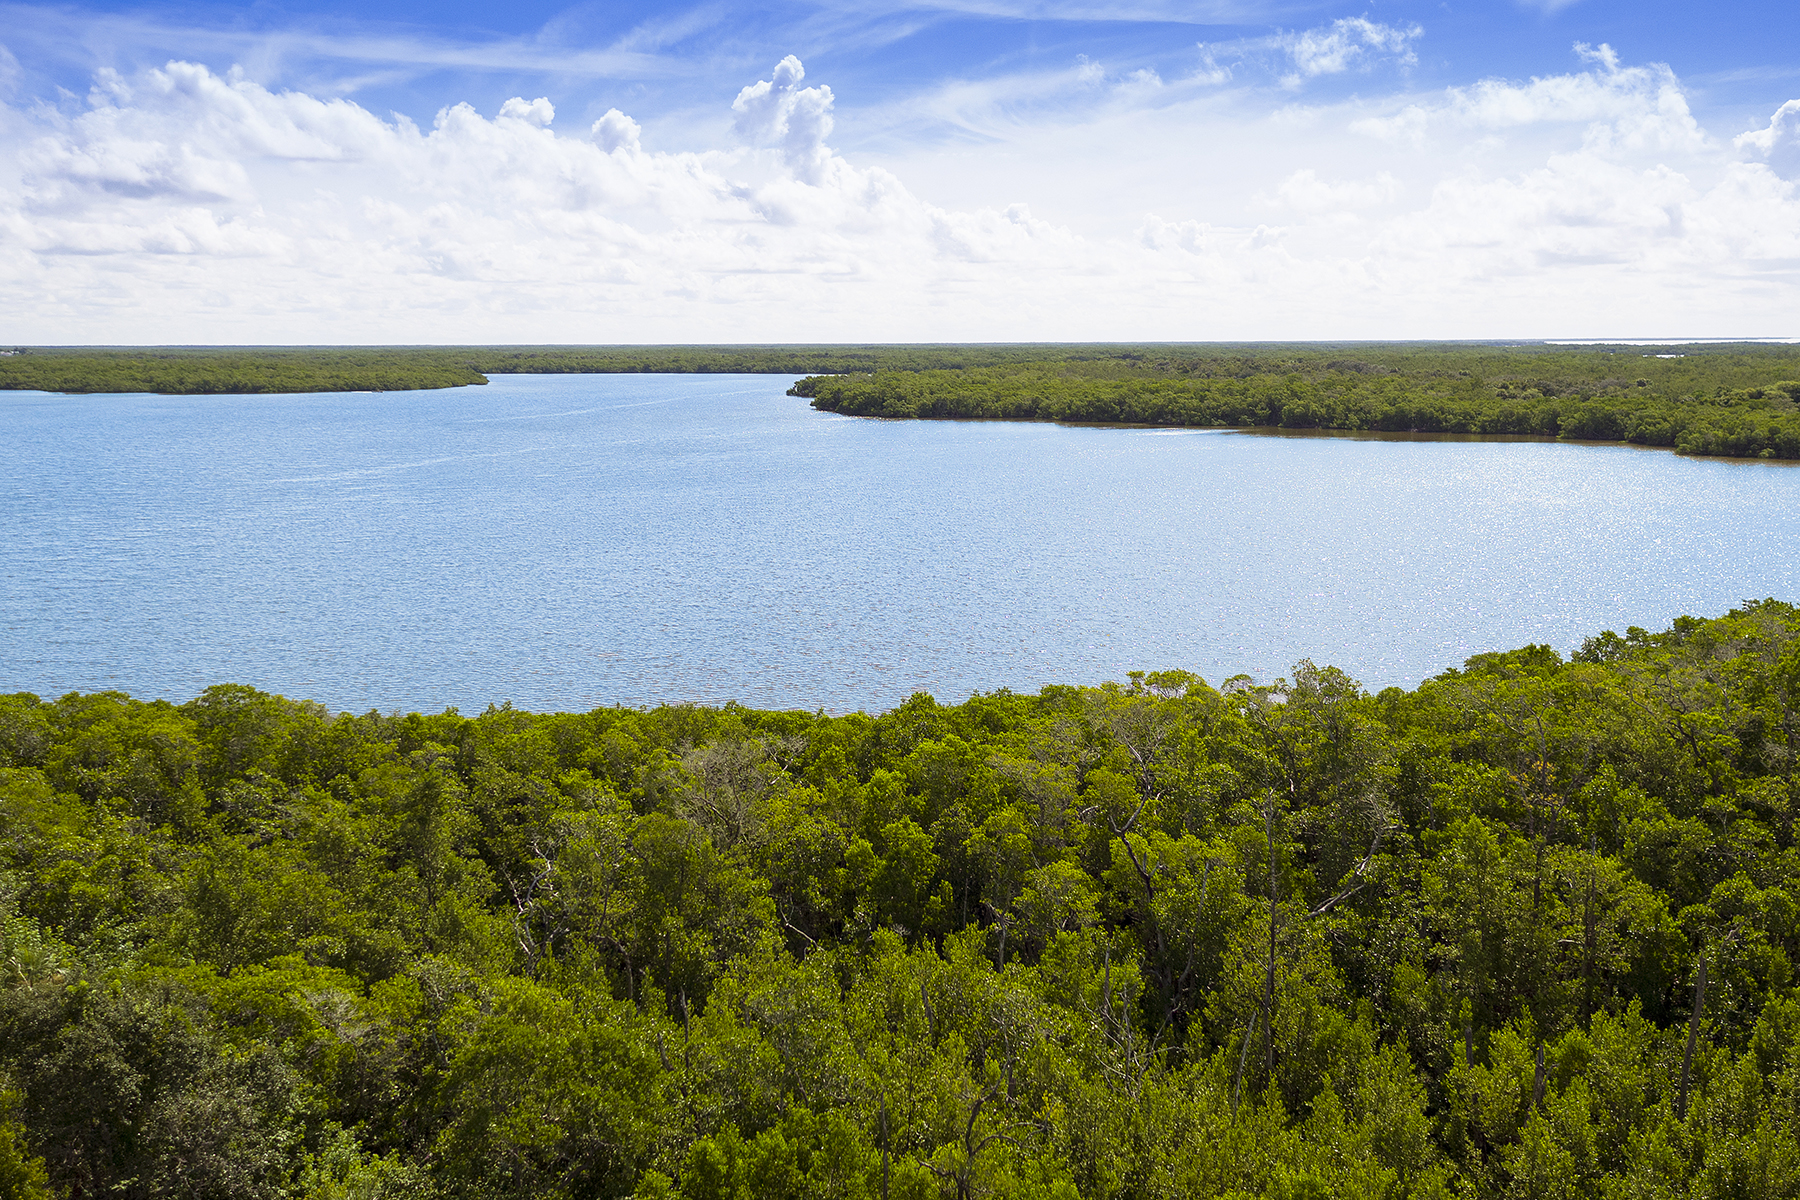 Đất đai vì Bán tại MARCO ISLAND - HORR'S ISLAND 900 Whiskey Creek Dr Marco Island, Florida, 34145 Hoa Kỳ